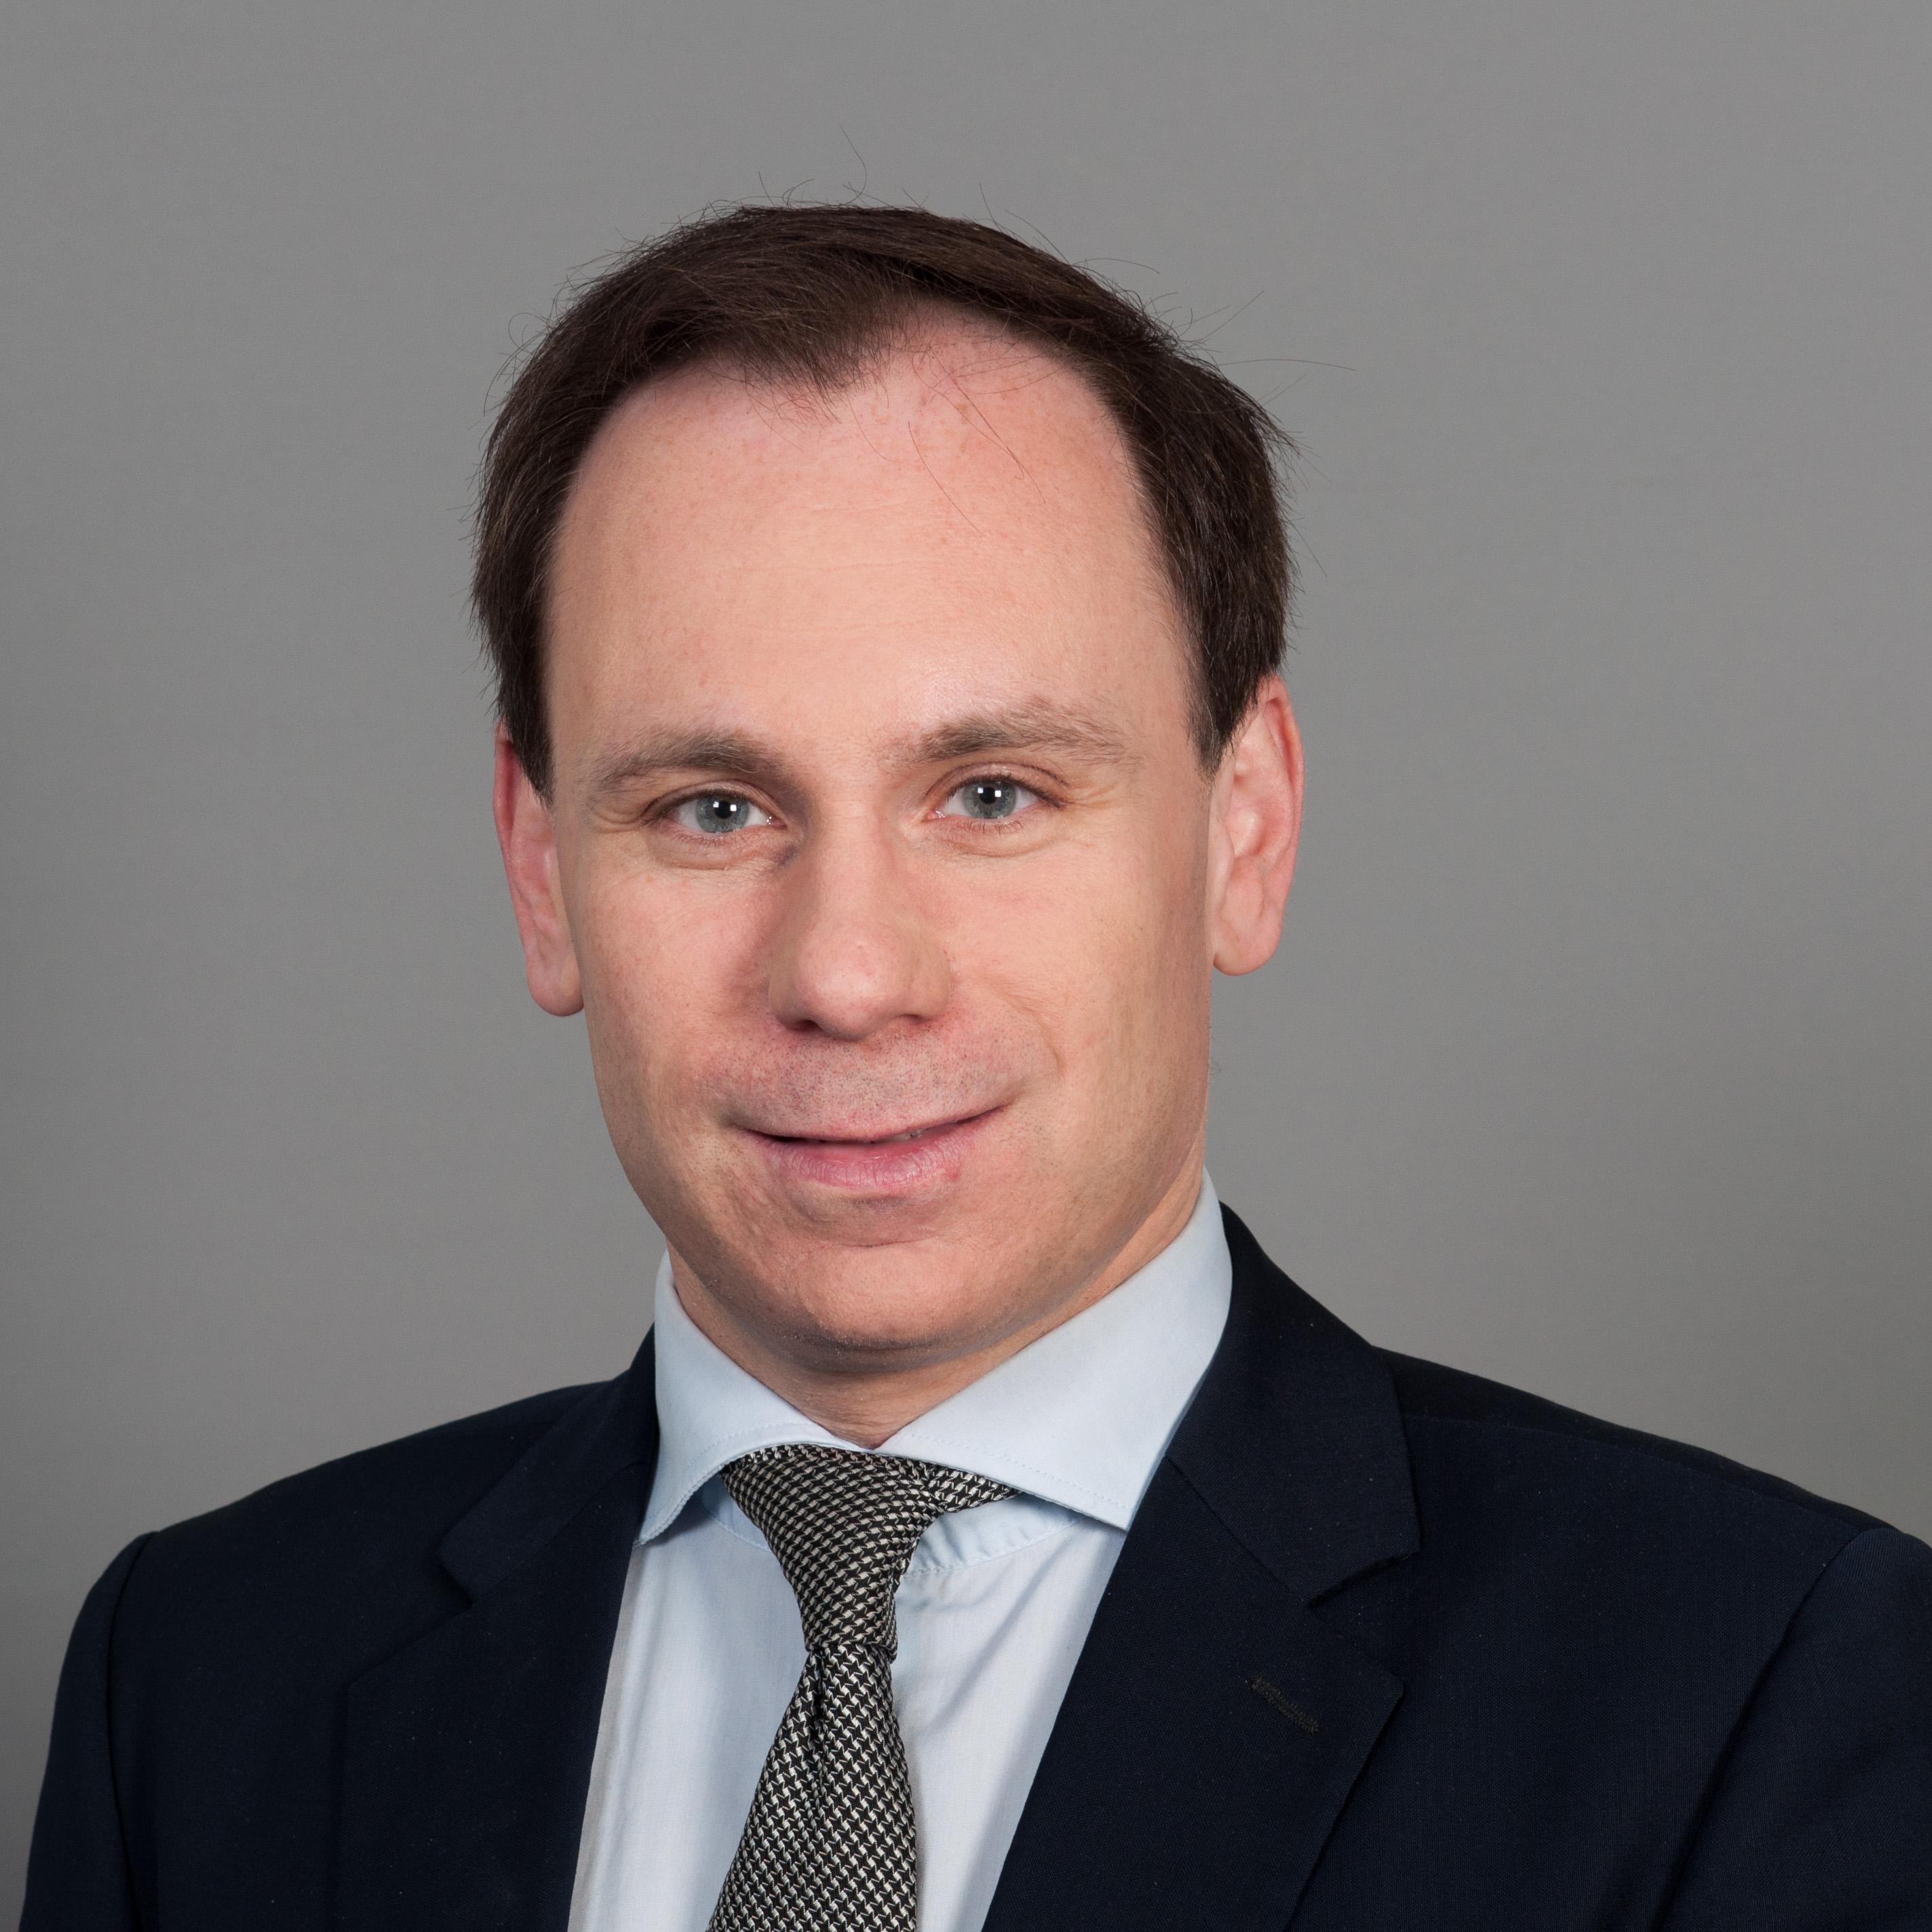 Volker Ullrich net worth salary